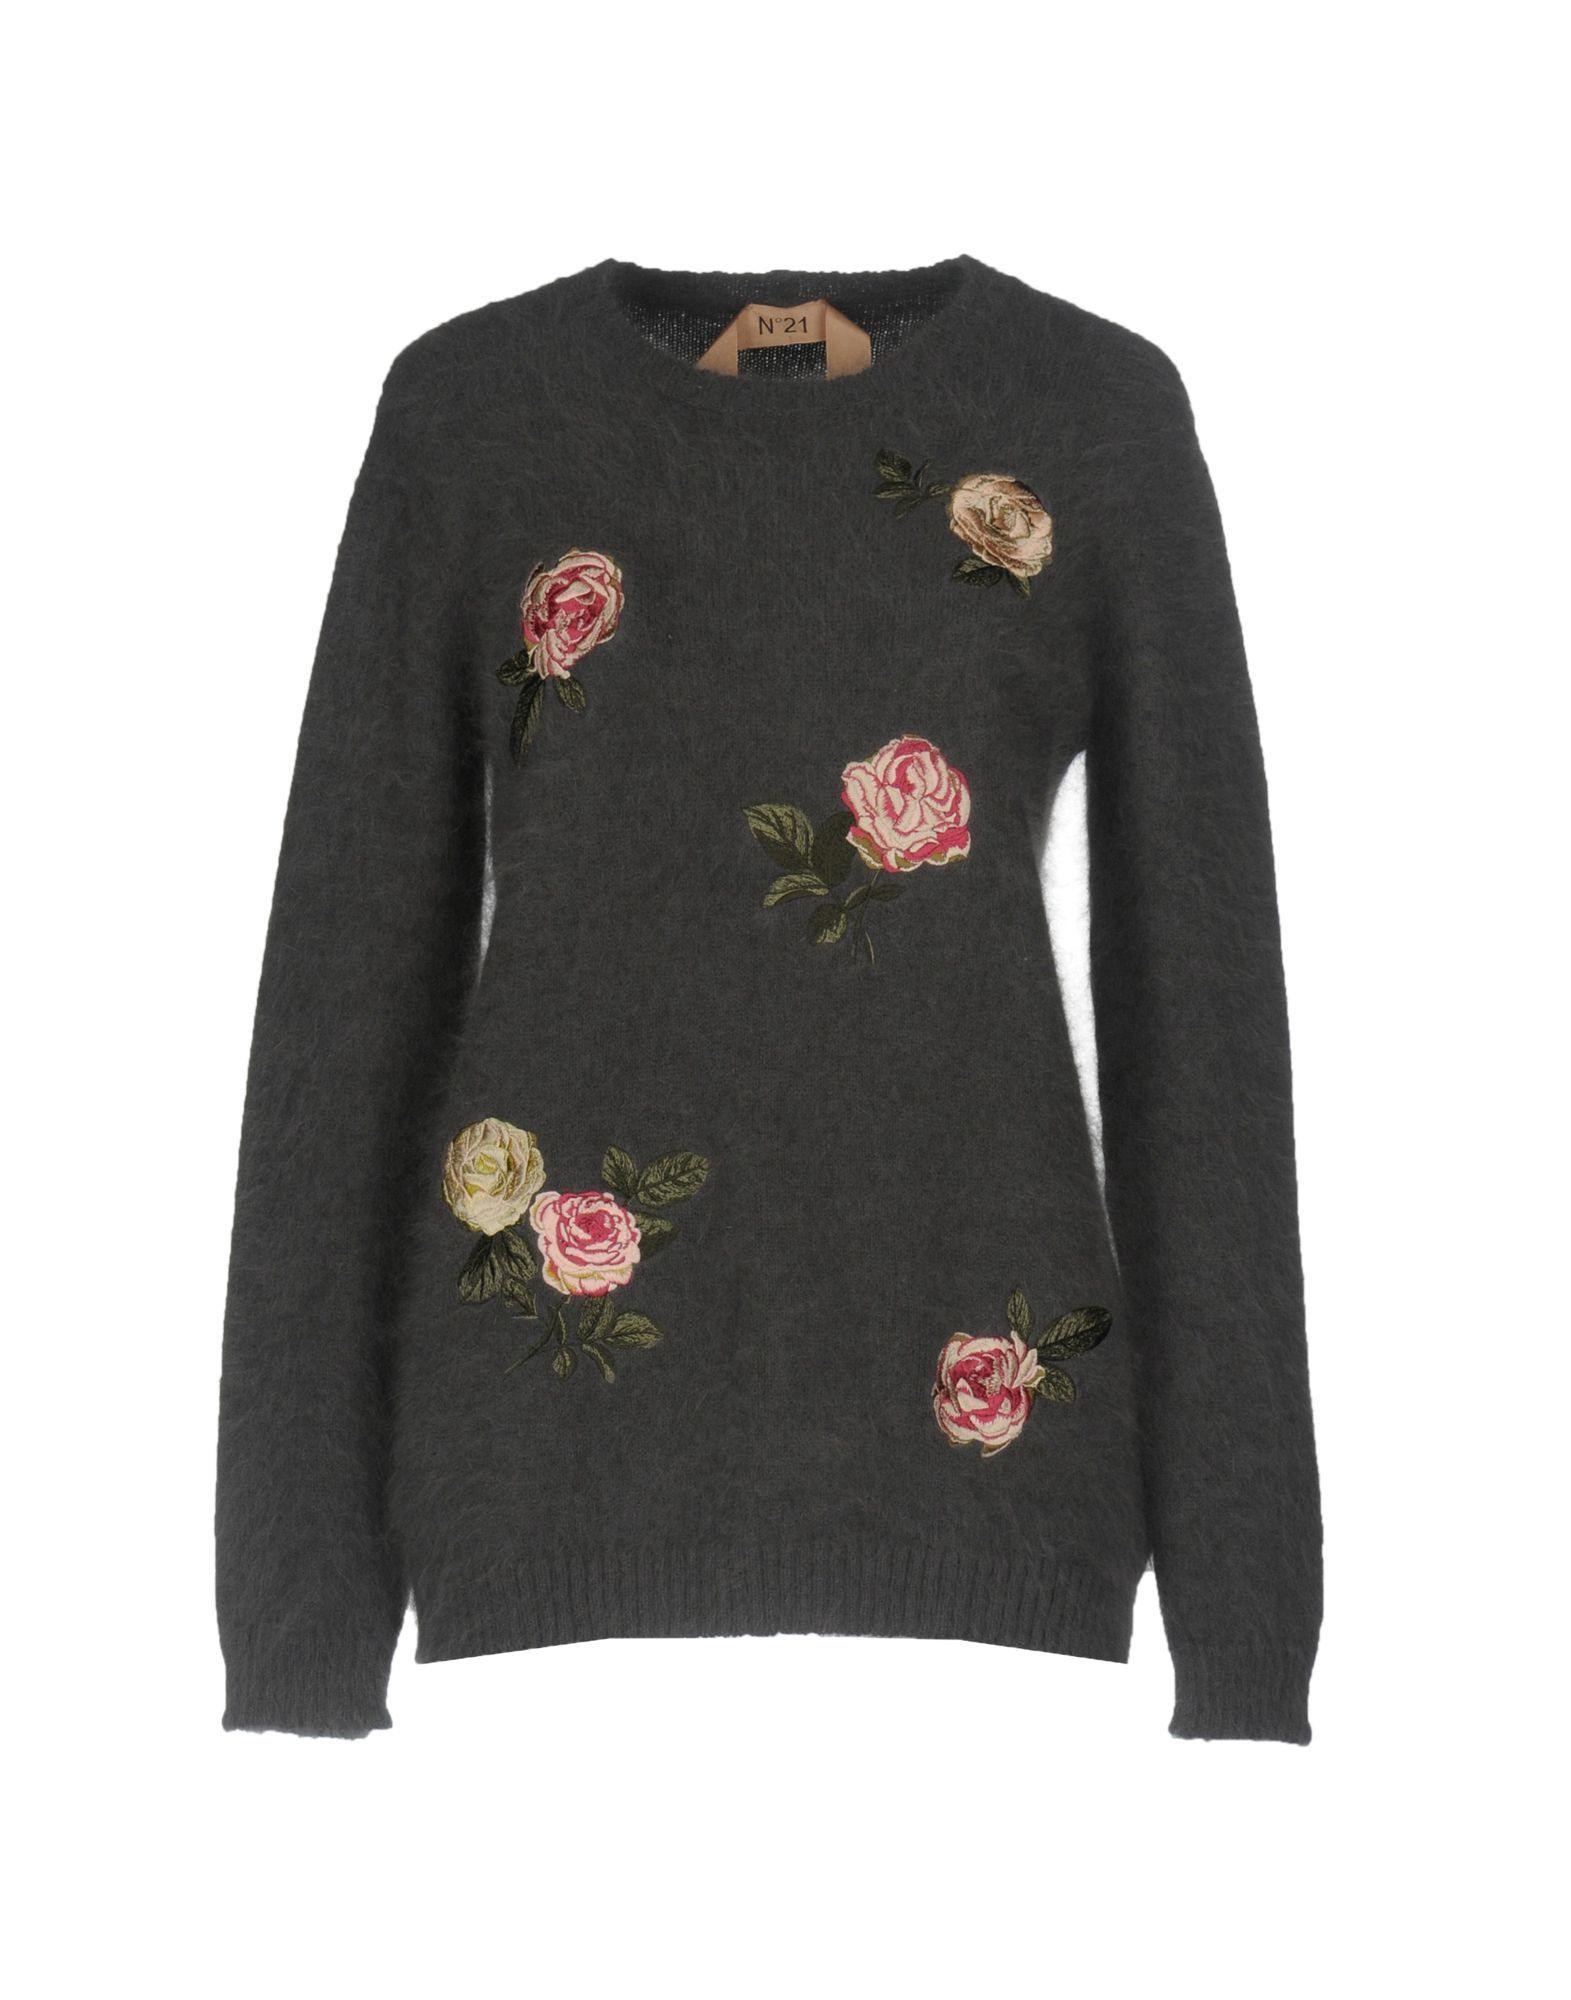 N�21 Lead Angora Knit Floral Design Embroidered Jumper